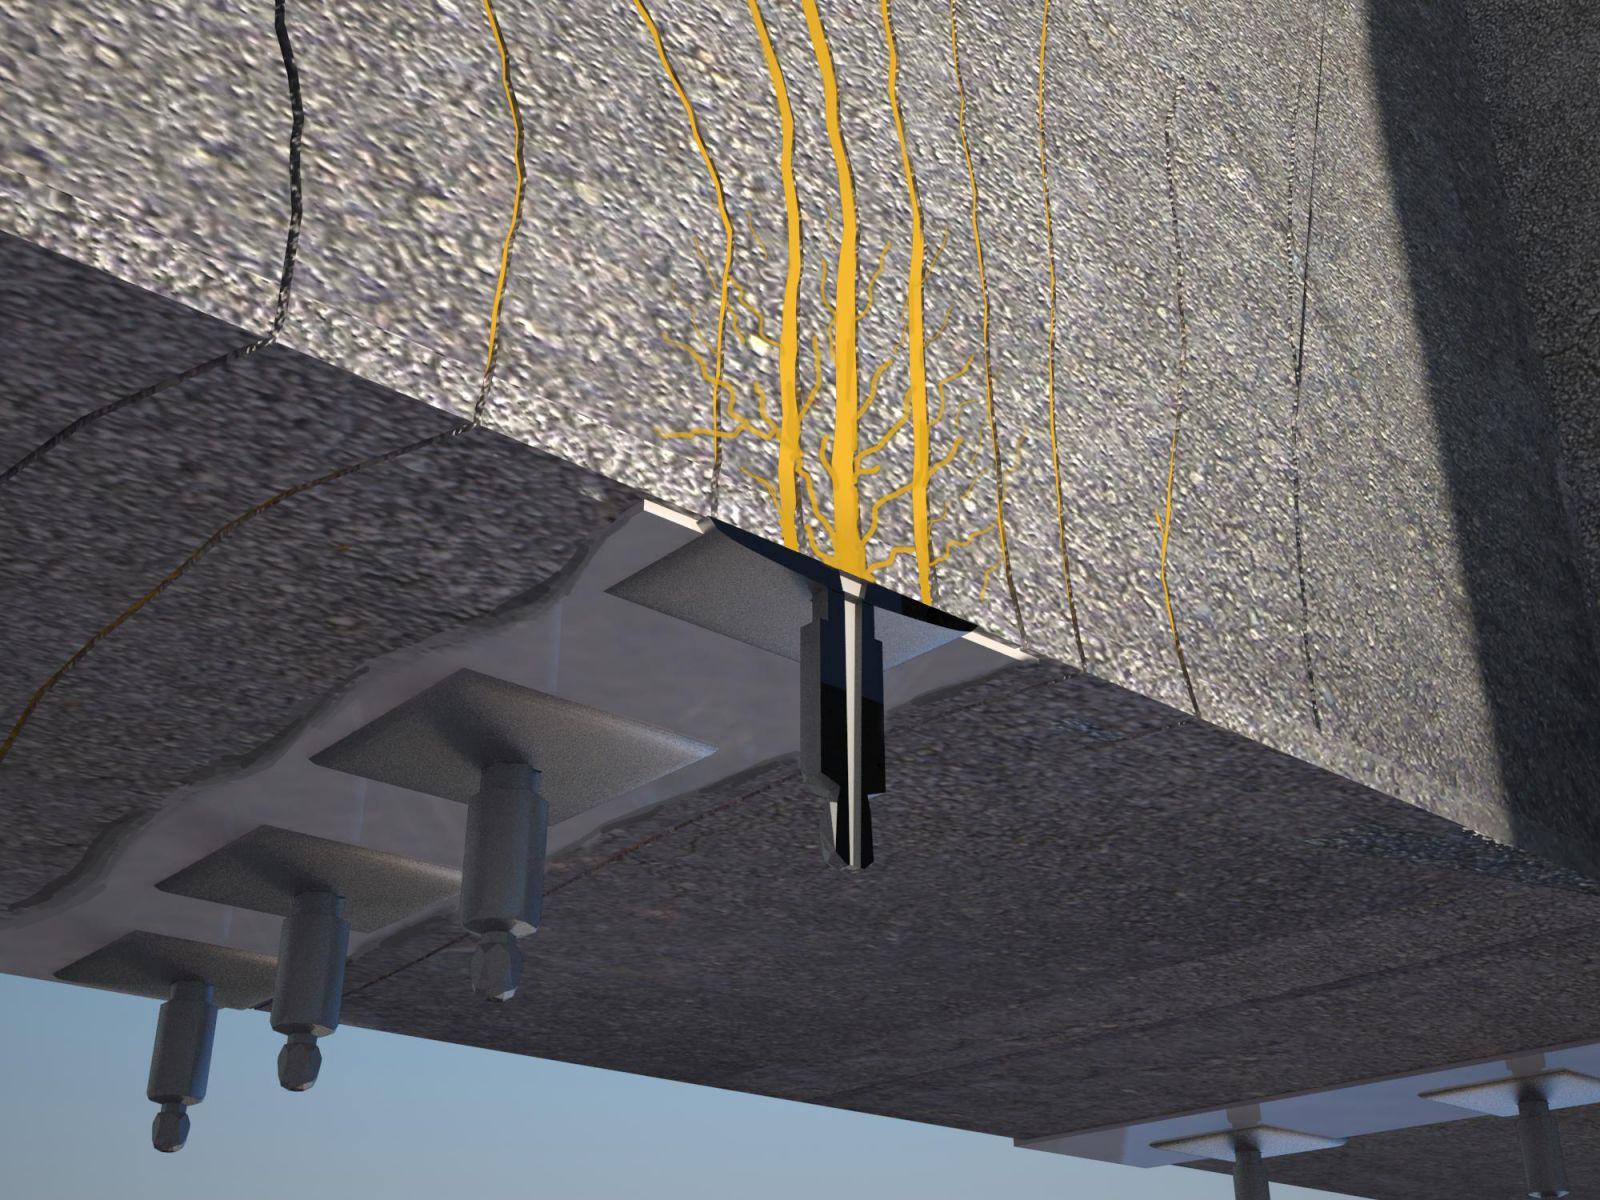 Инъектирование трещин в бетоне